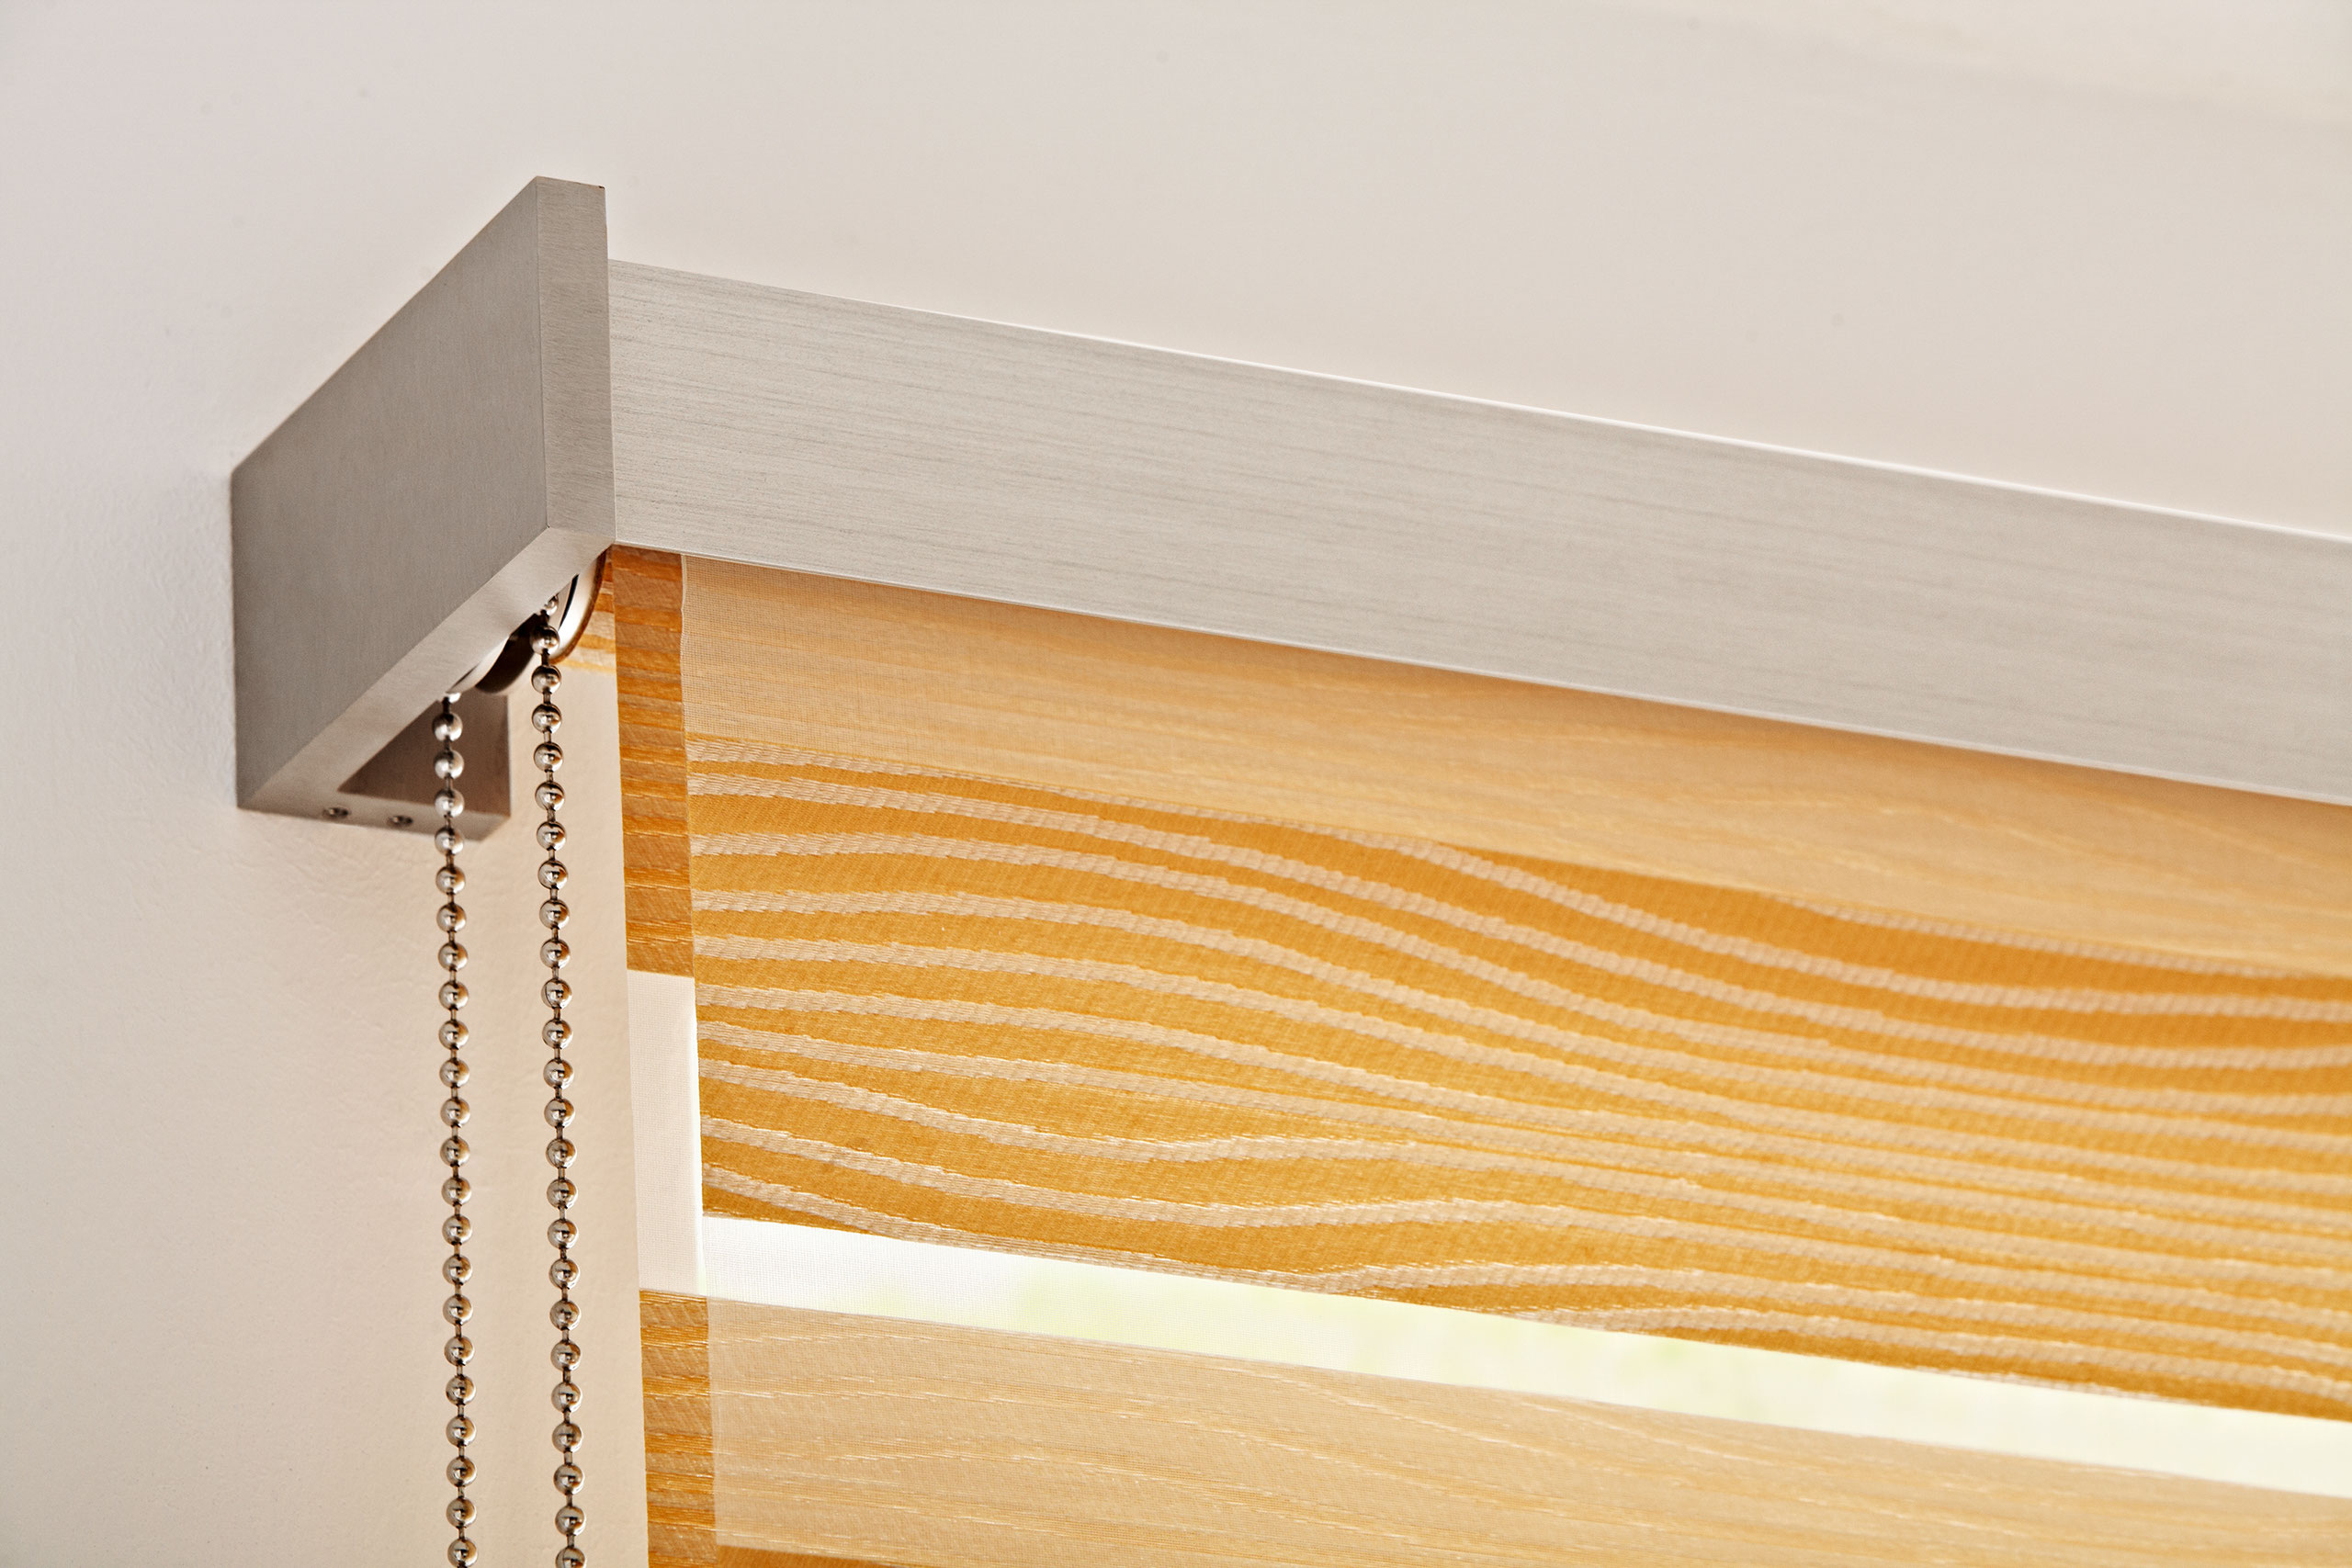 doppelrollo sonnenschutz h ndler berlin. Black Bedroom Furniture Sets. Home Design Ideas